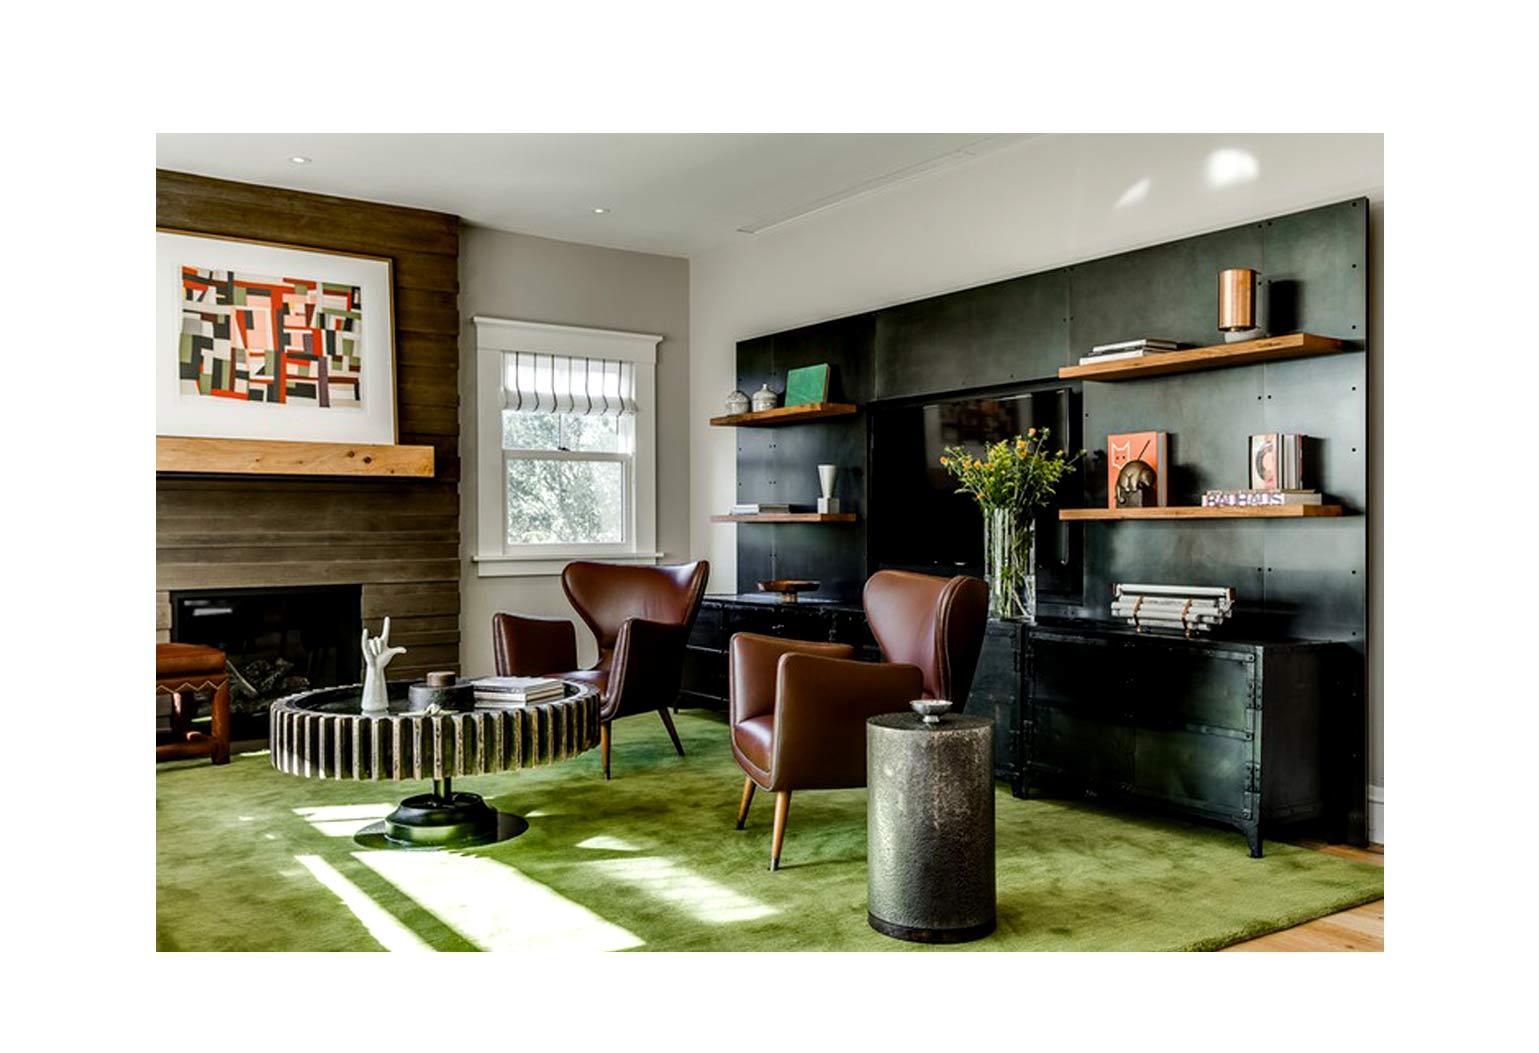 Design An Art centric Room012jpg 1 - چگونه یک اتاق هنری را طراحی کنیم؟